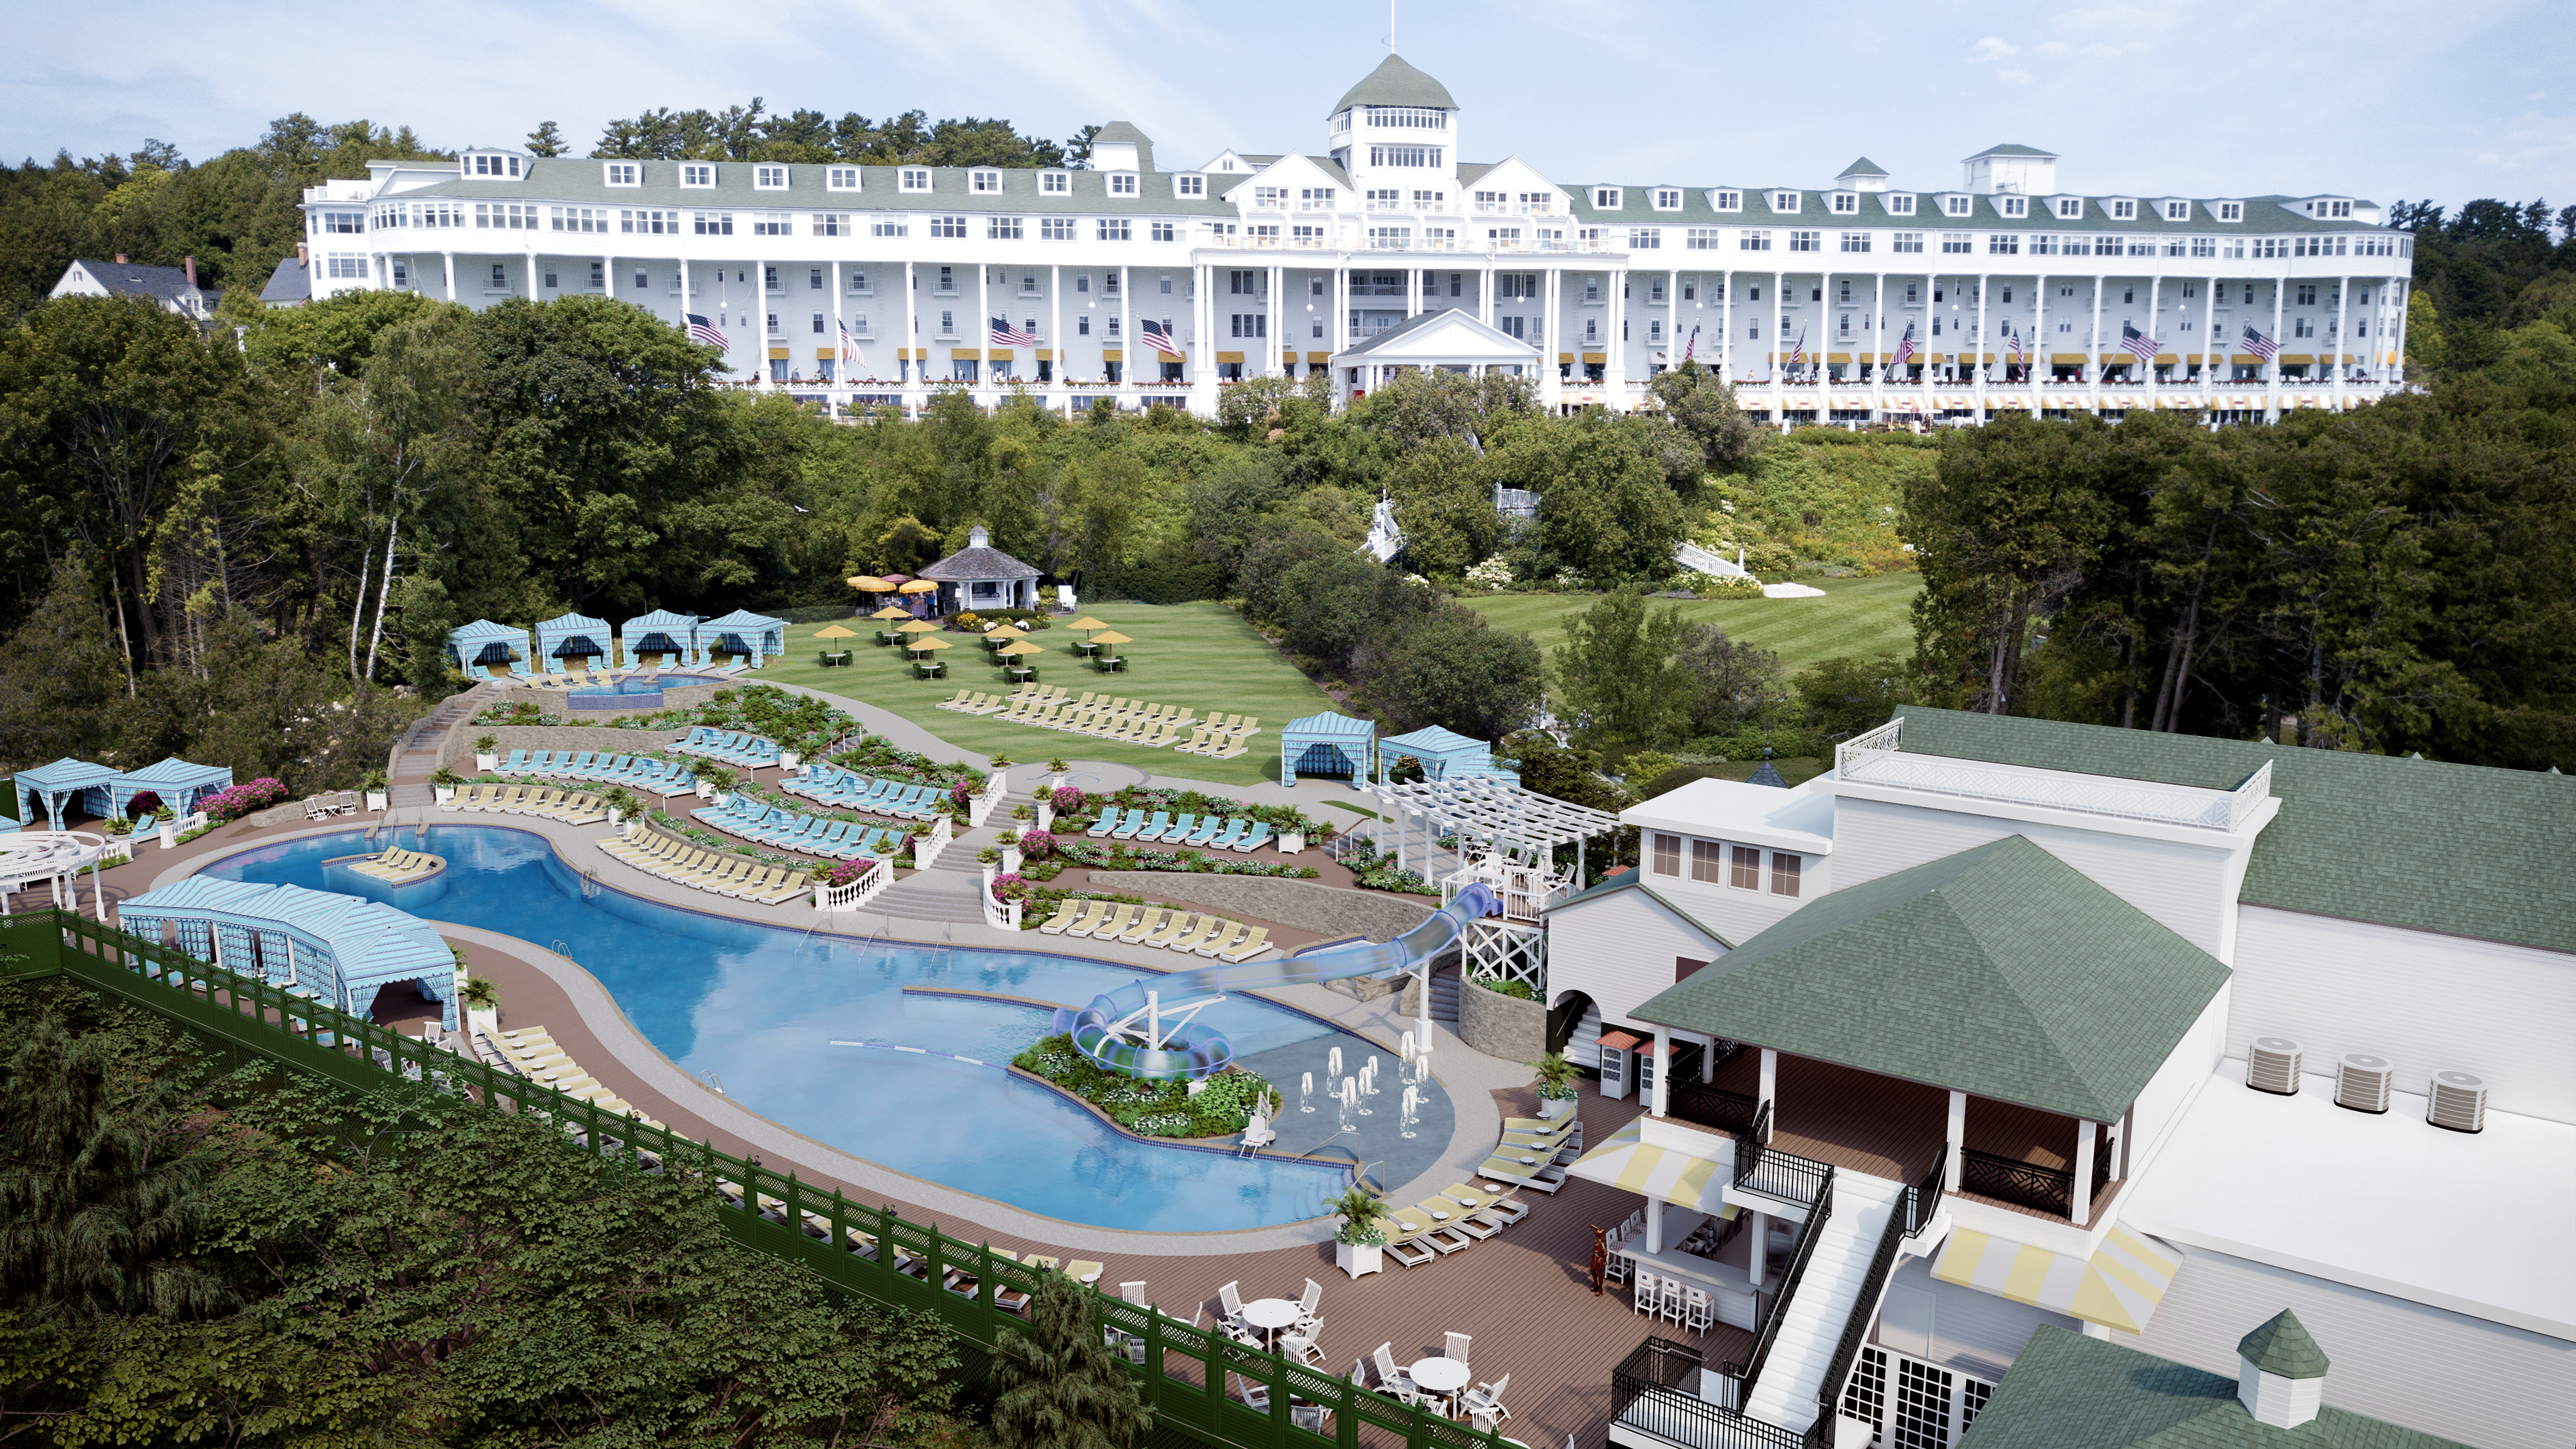 Sneak Peek At Mackinac Island S Grand Hotel Pool Renovations Waterslide Cabanas Adults Only Area Mlive Com